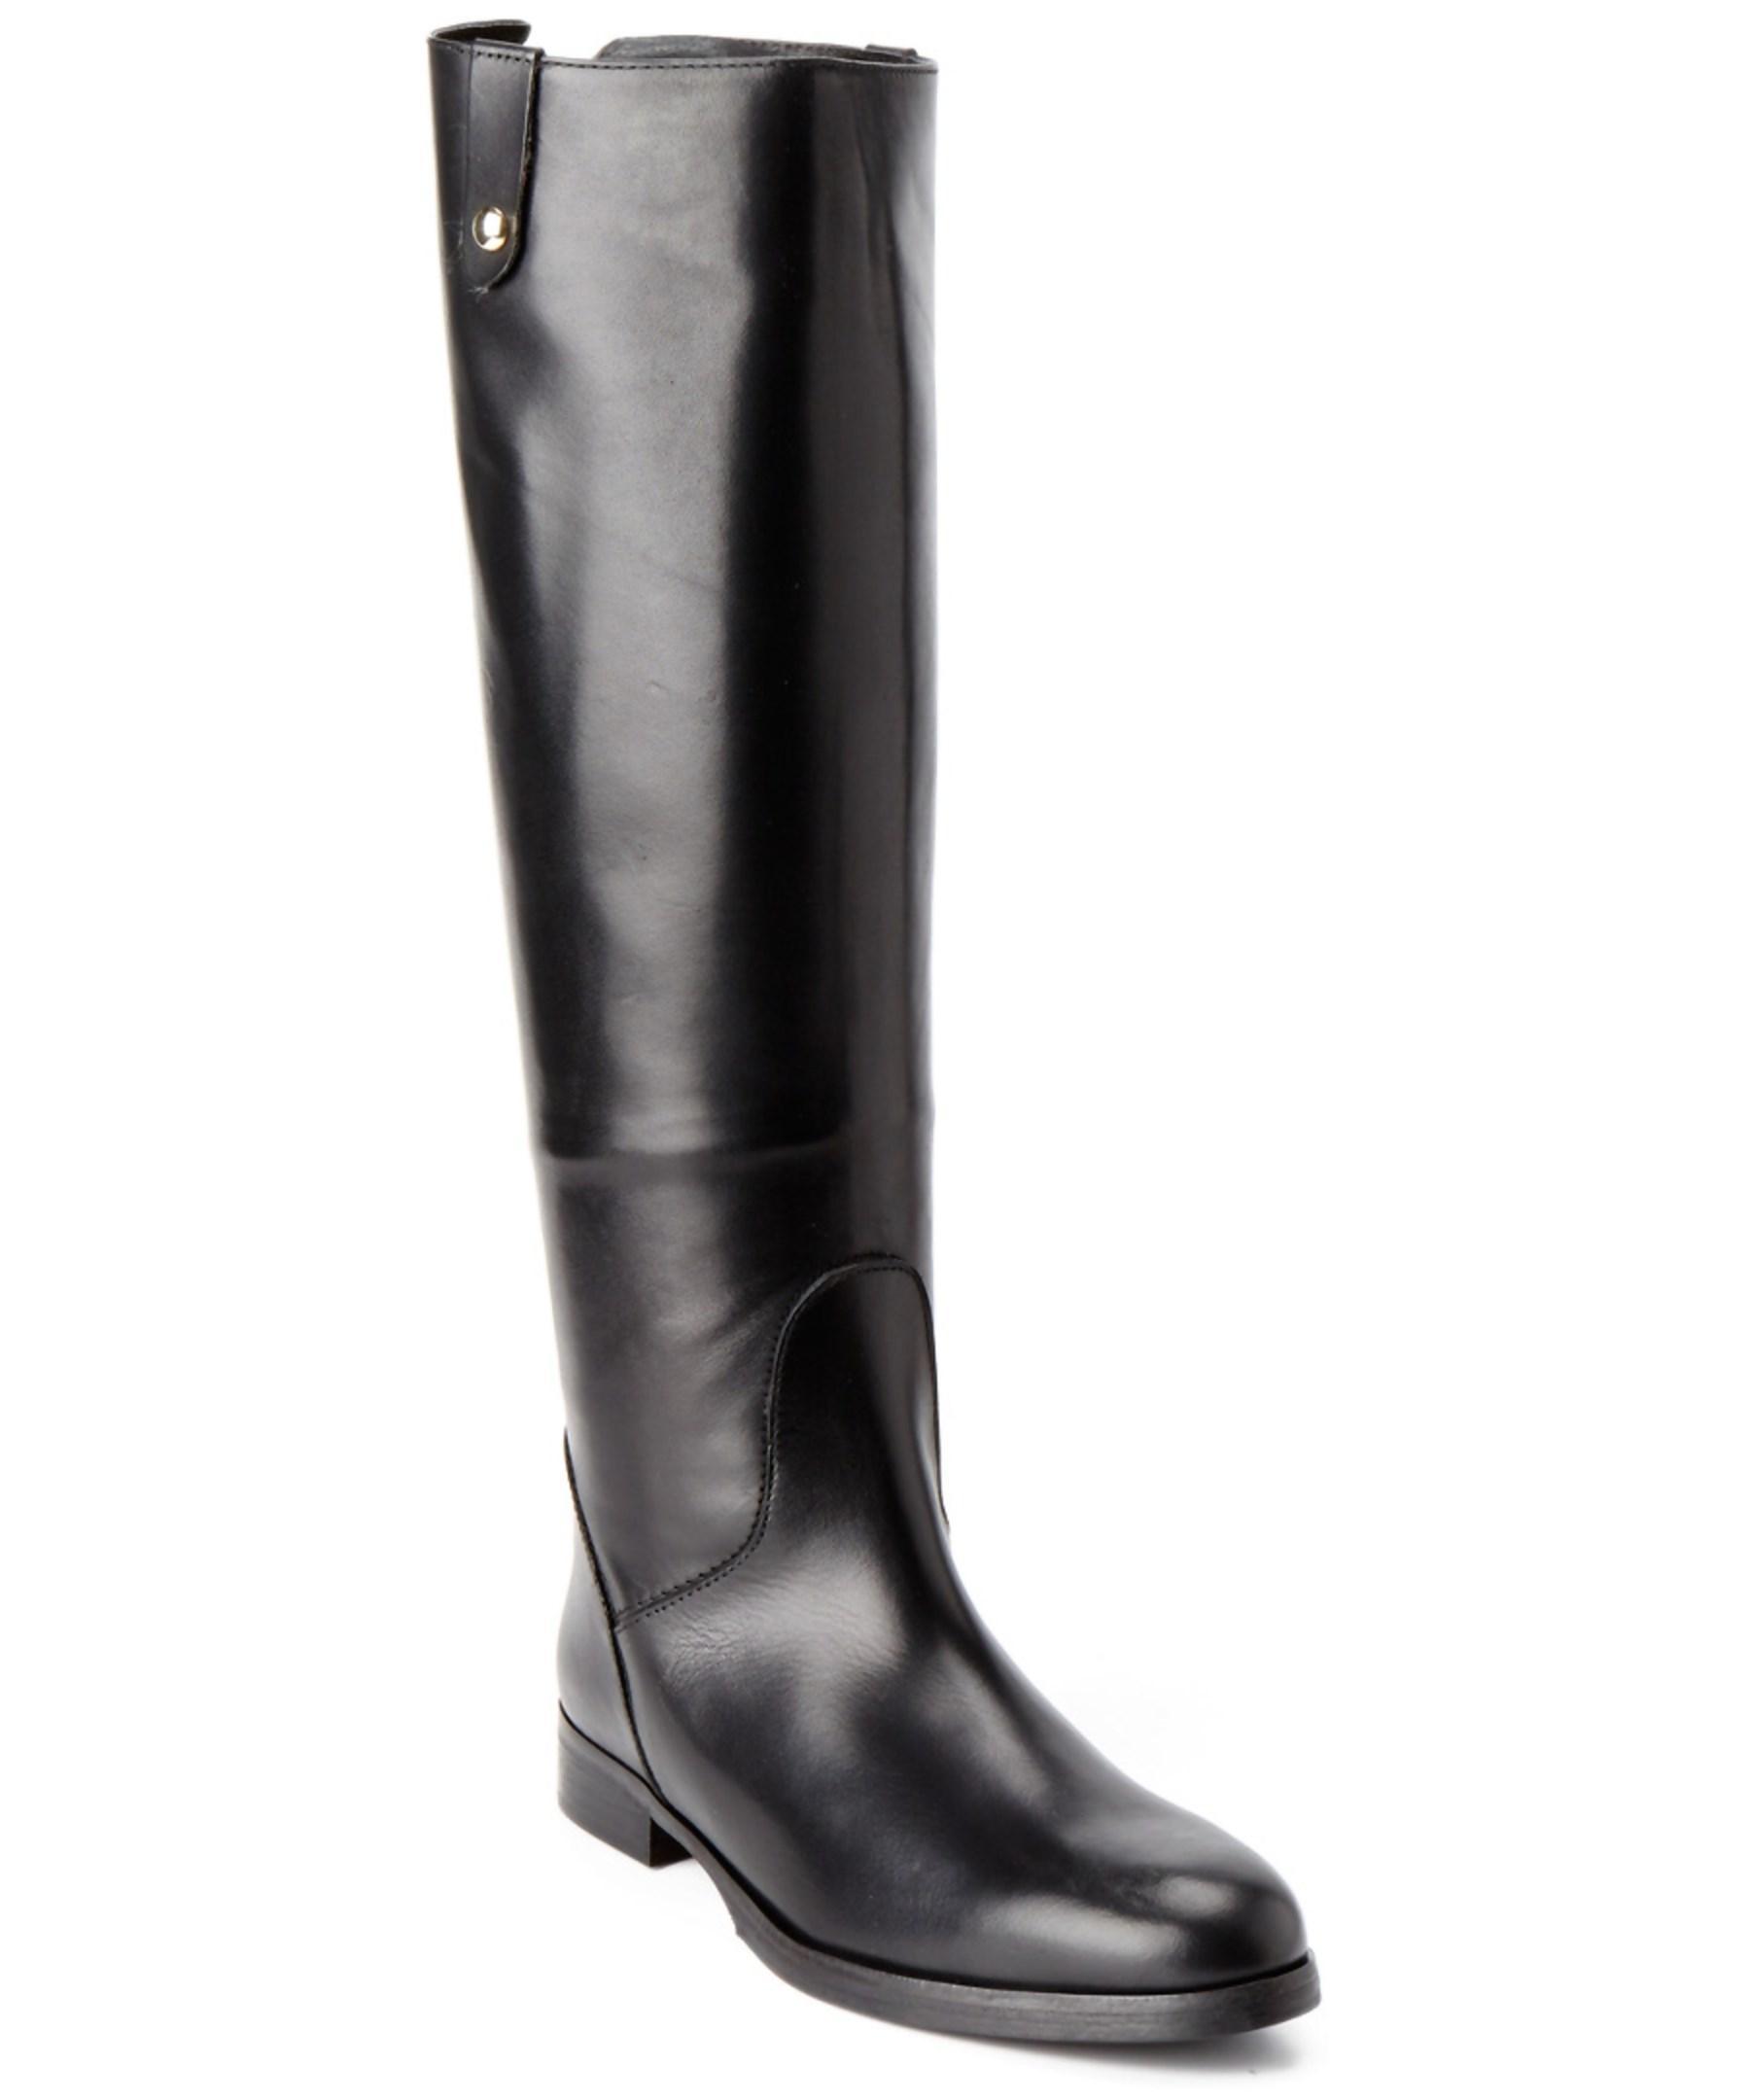 charles david jola leather boot in black lyst